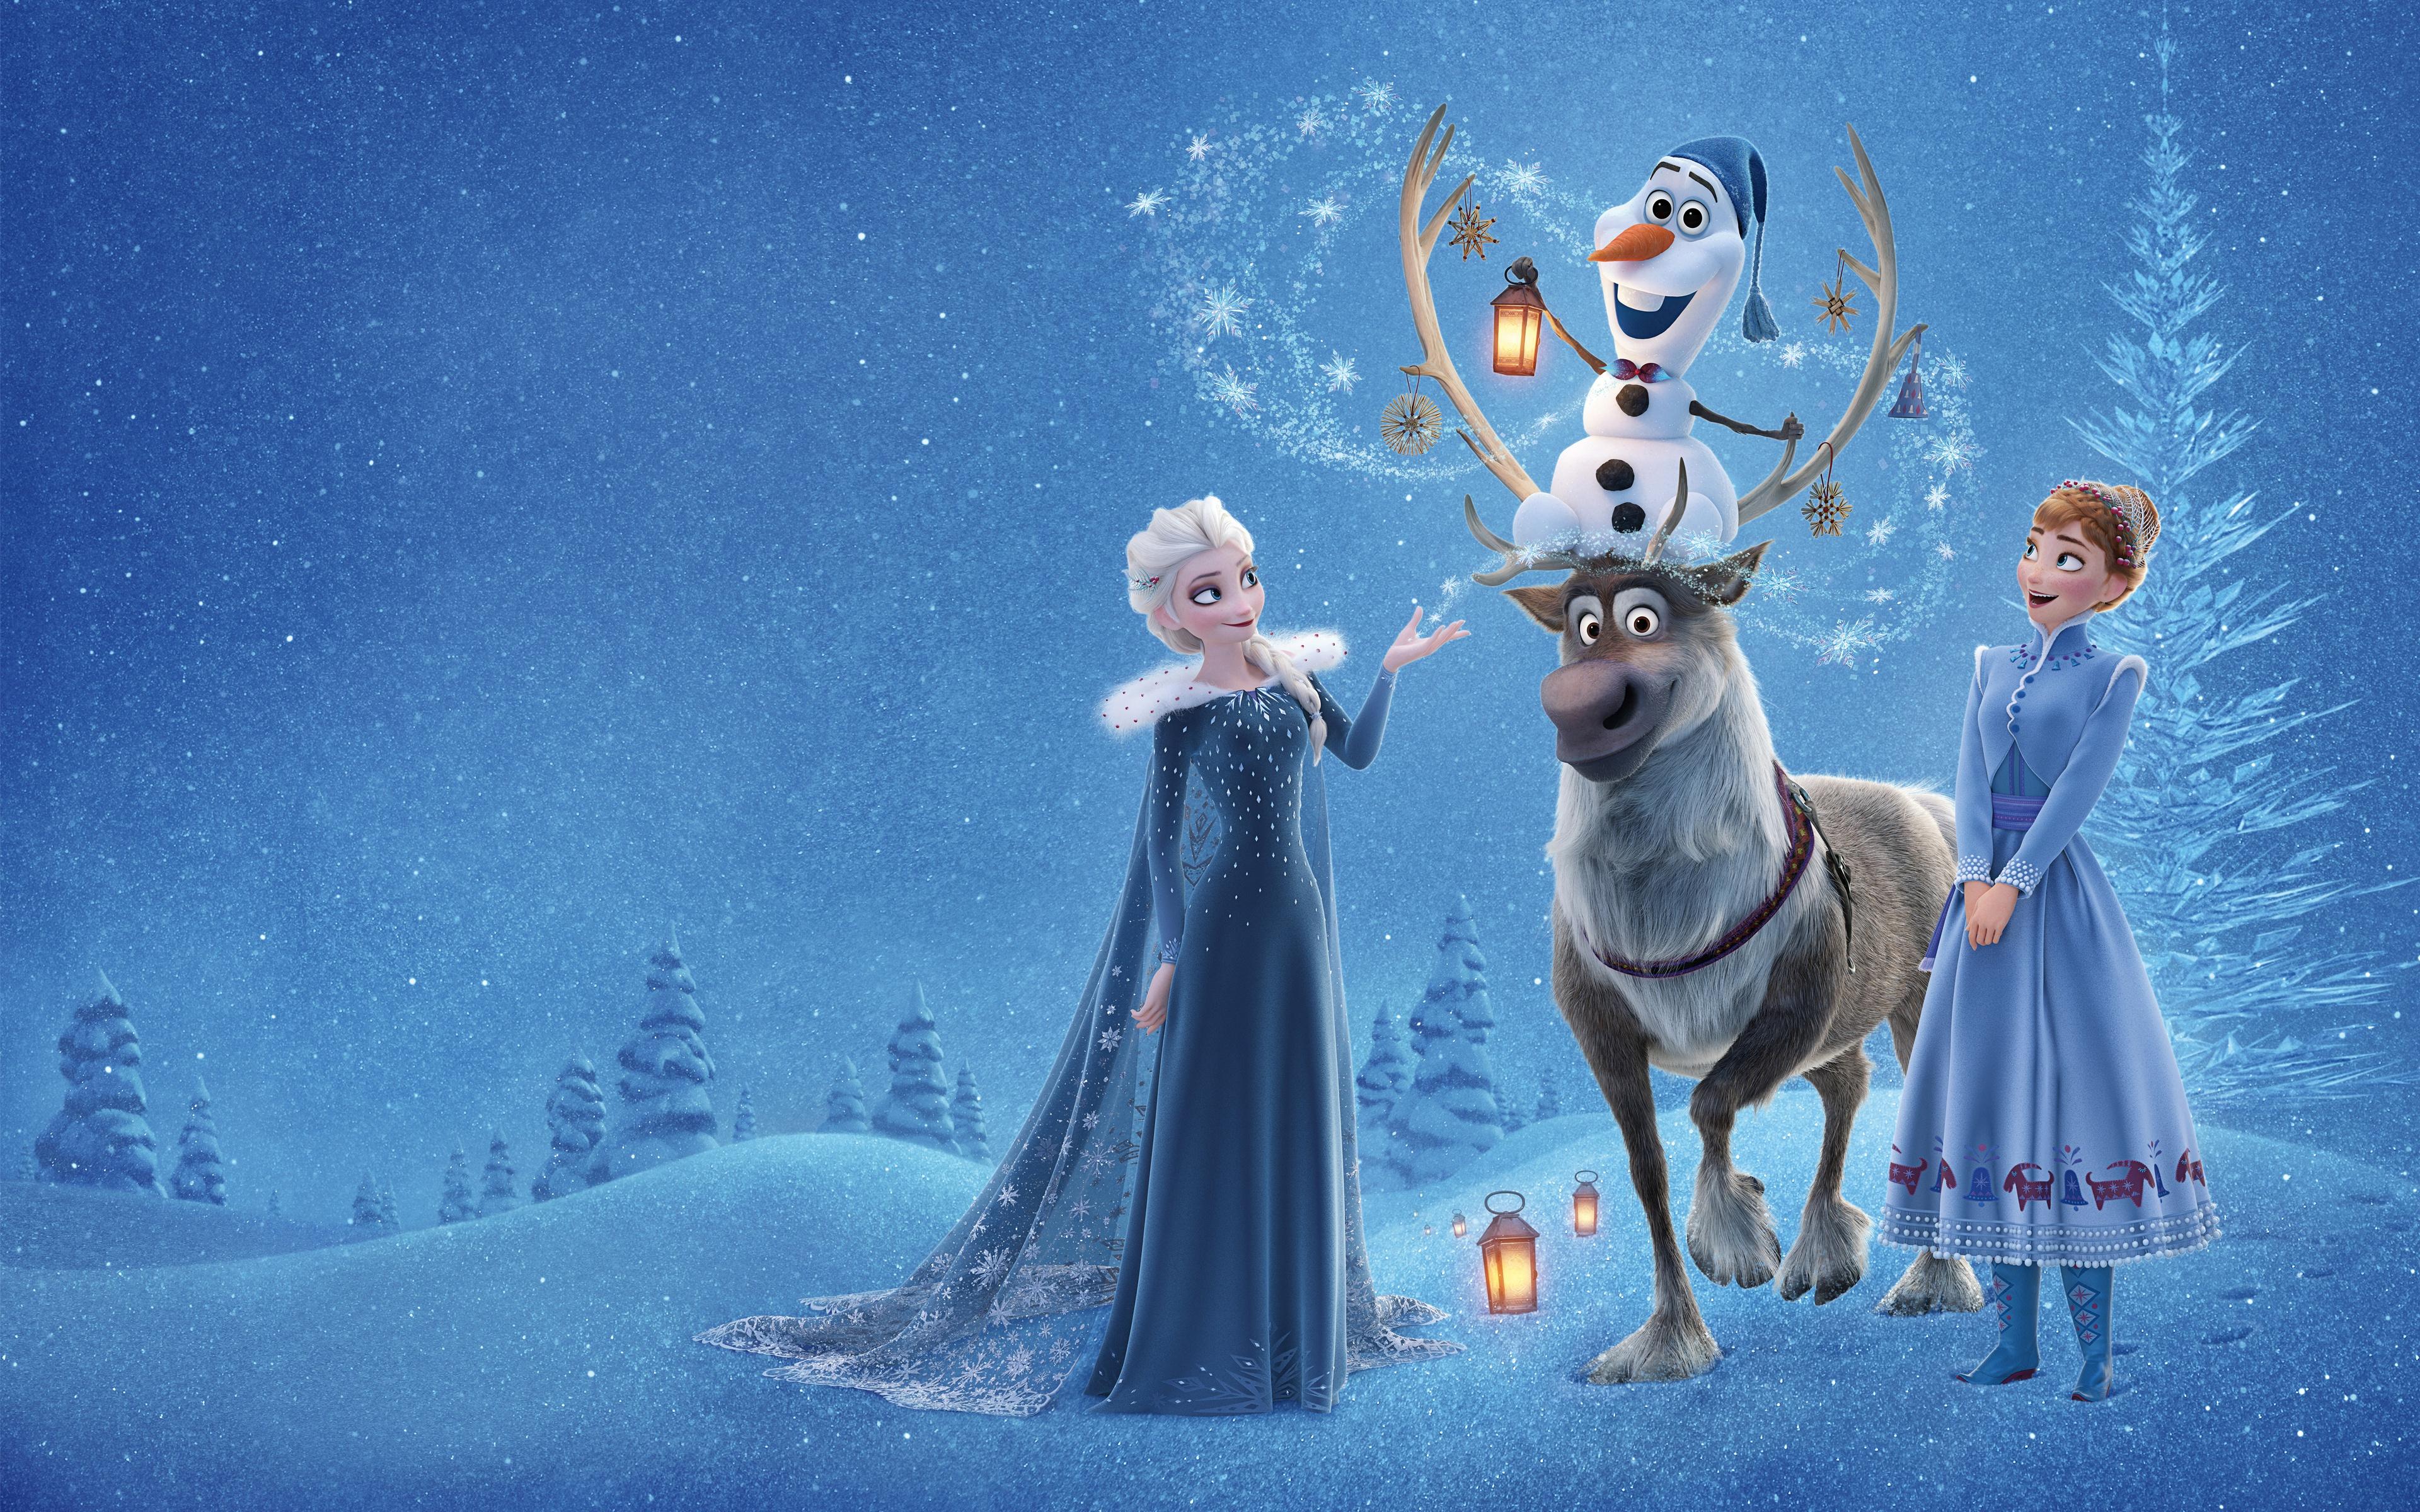 Anna Frozen Elsa Frozen Frozen Movie Olaf Frozen Sven Frozen 3840x2400